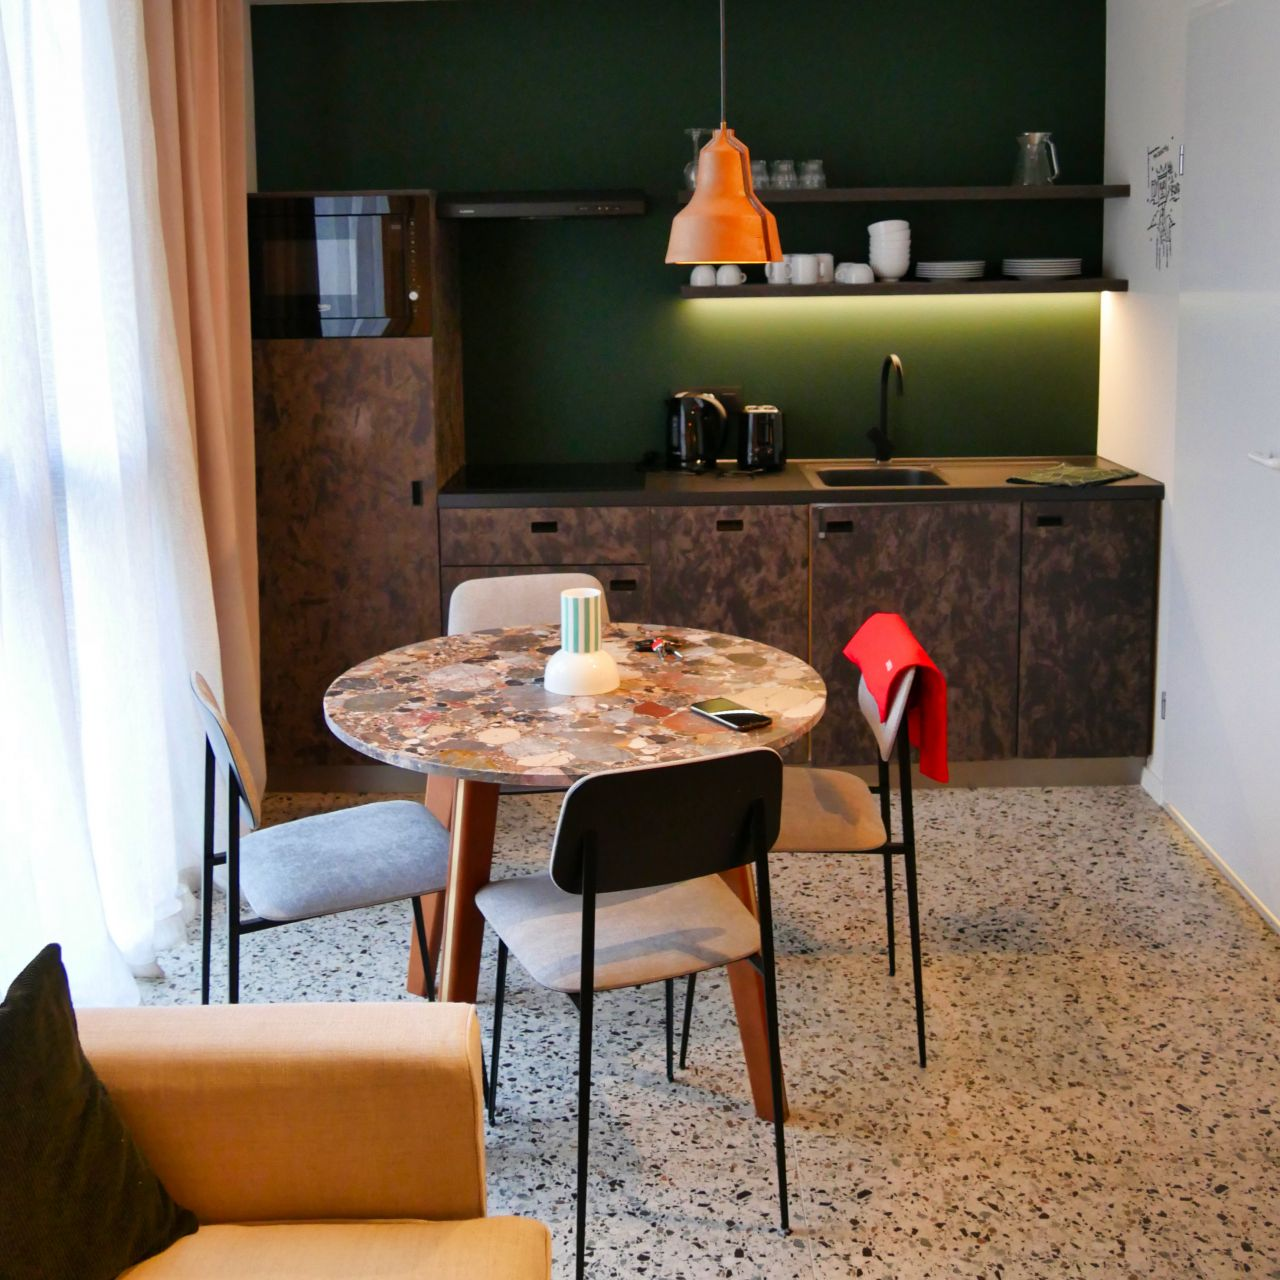 YUST hotel Antwerpen5